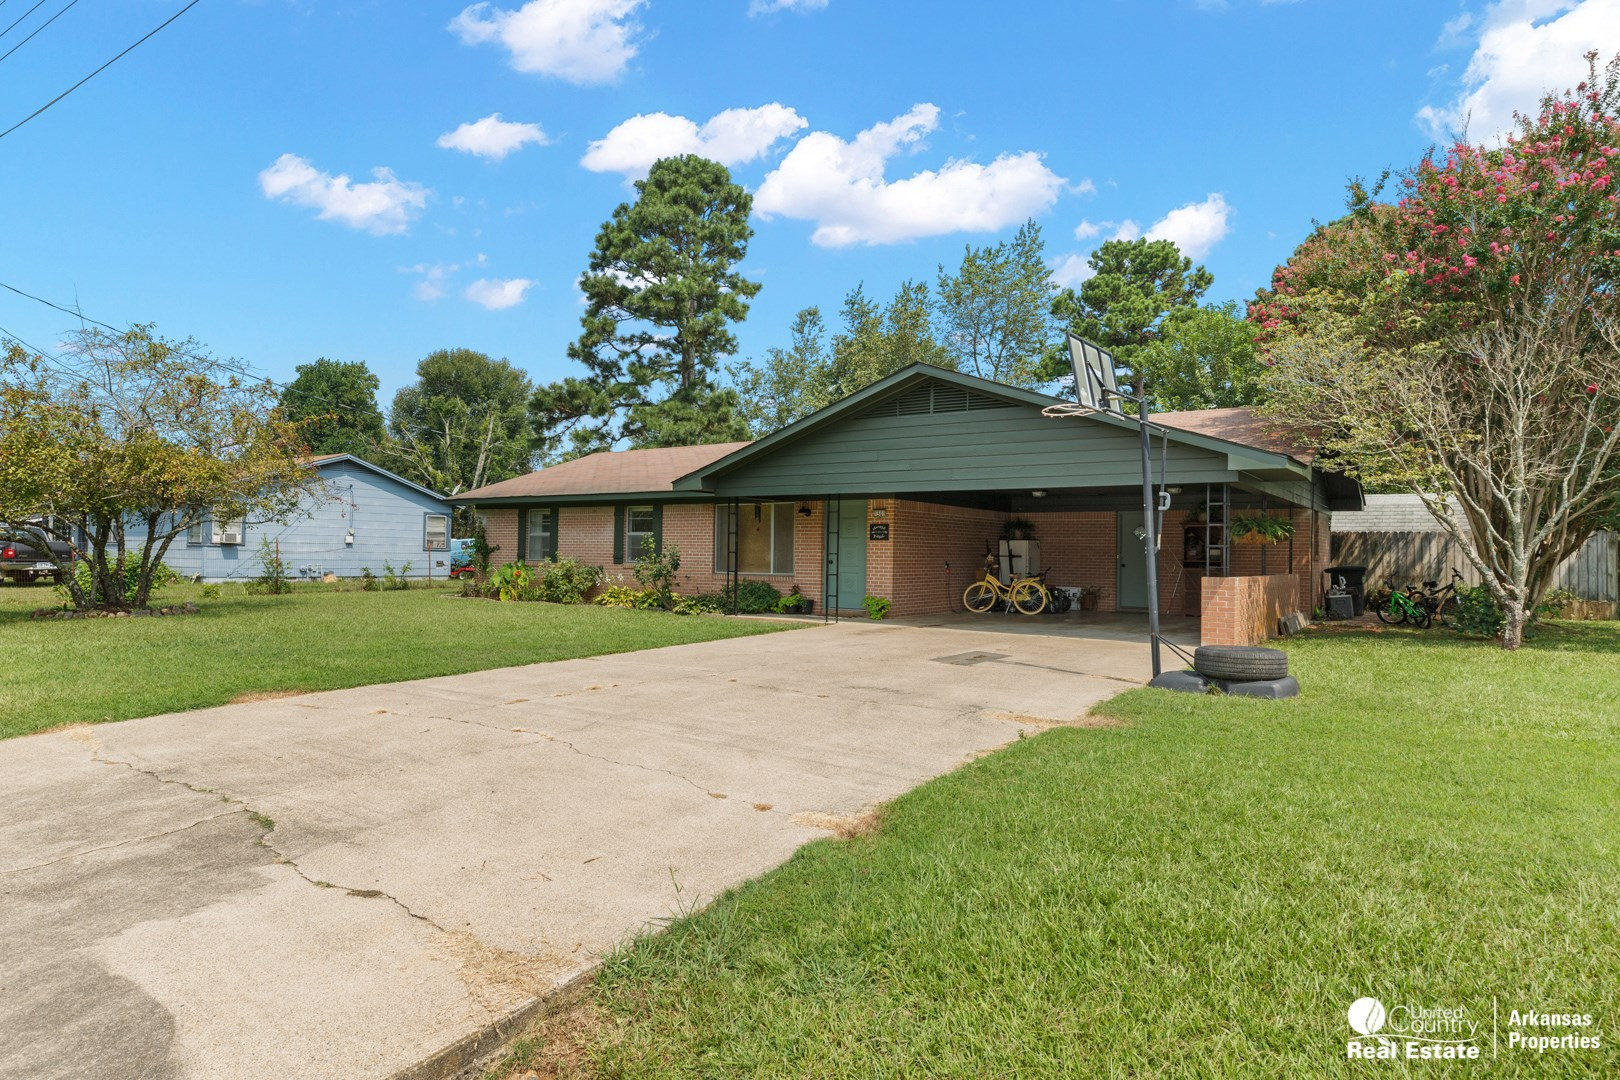 Brick Home for Sale in Mena, Arkansas